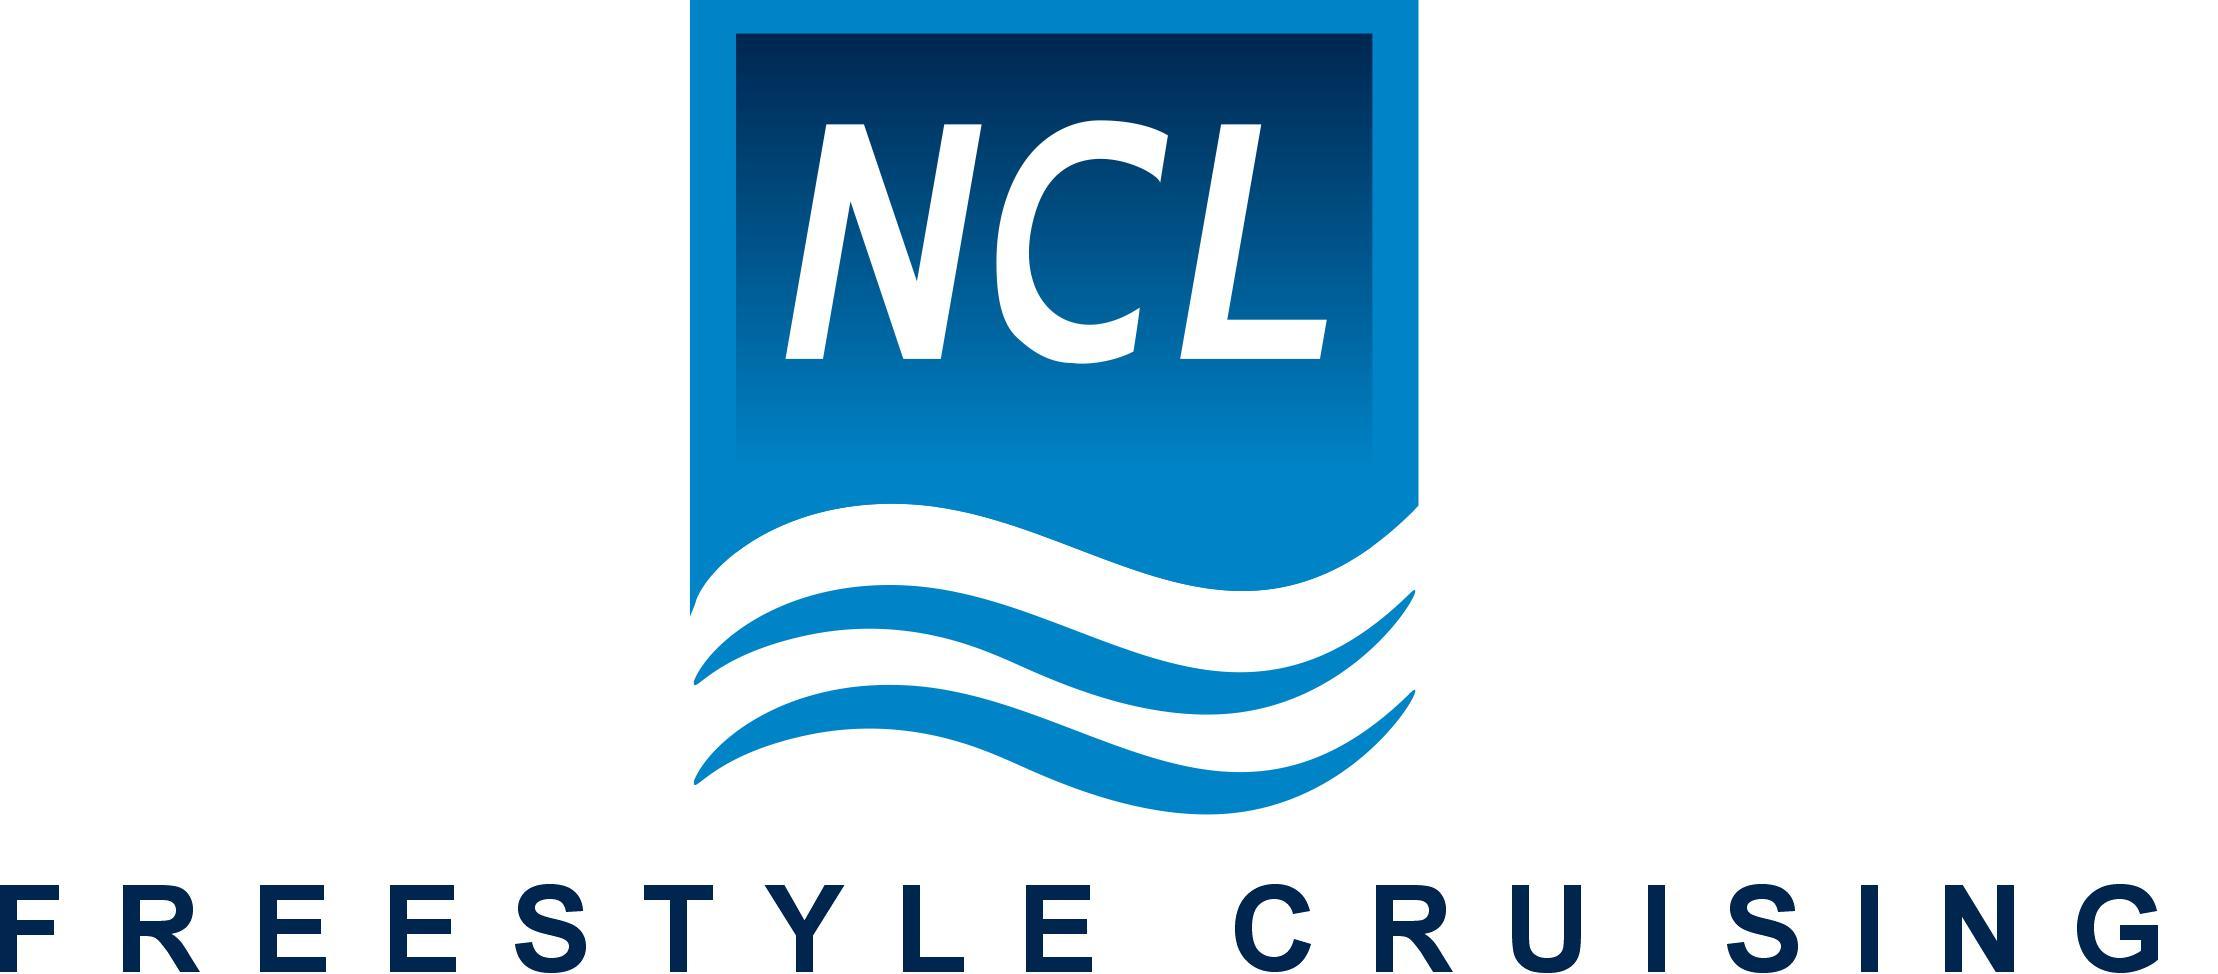 Ms pride of america norwegian cruise line - Ms Pride Of America Norwegian Cruise Line 17